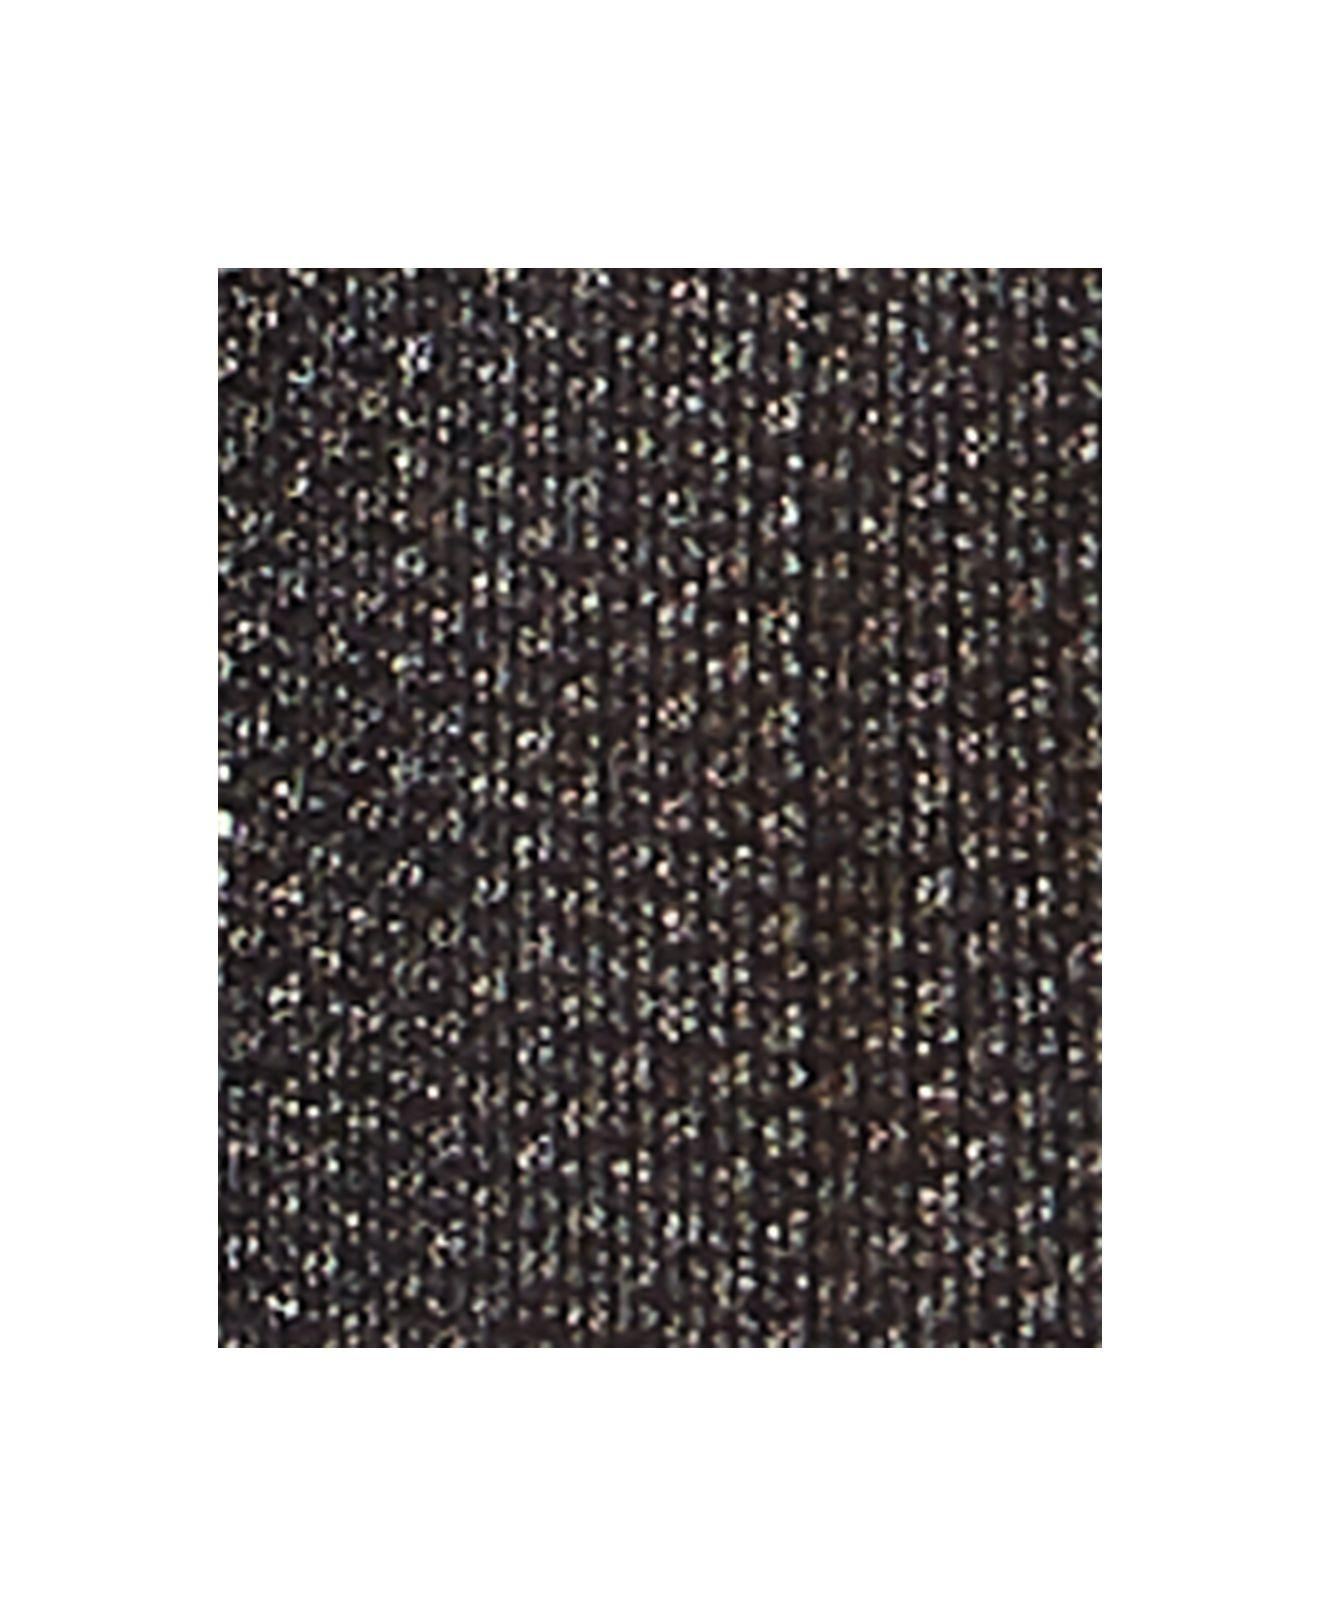 ec032a40175 DKNY - Slim-fit Chocolate Brown Diamond Pattern Wool Sport Coat for Men -  Lyst. View fullscreen